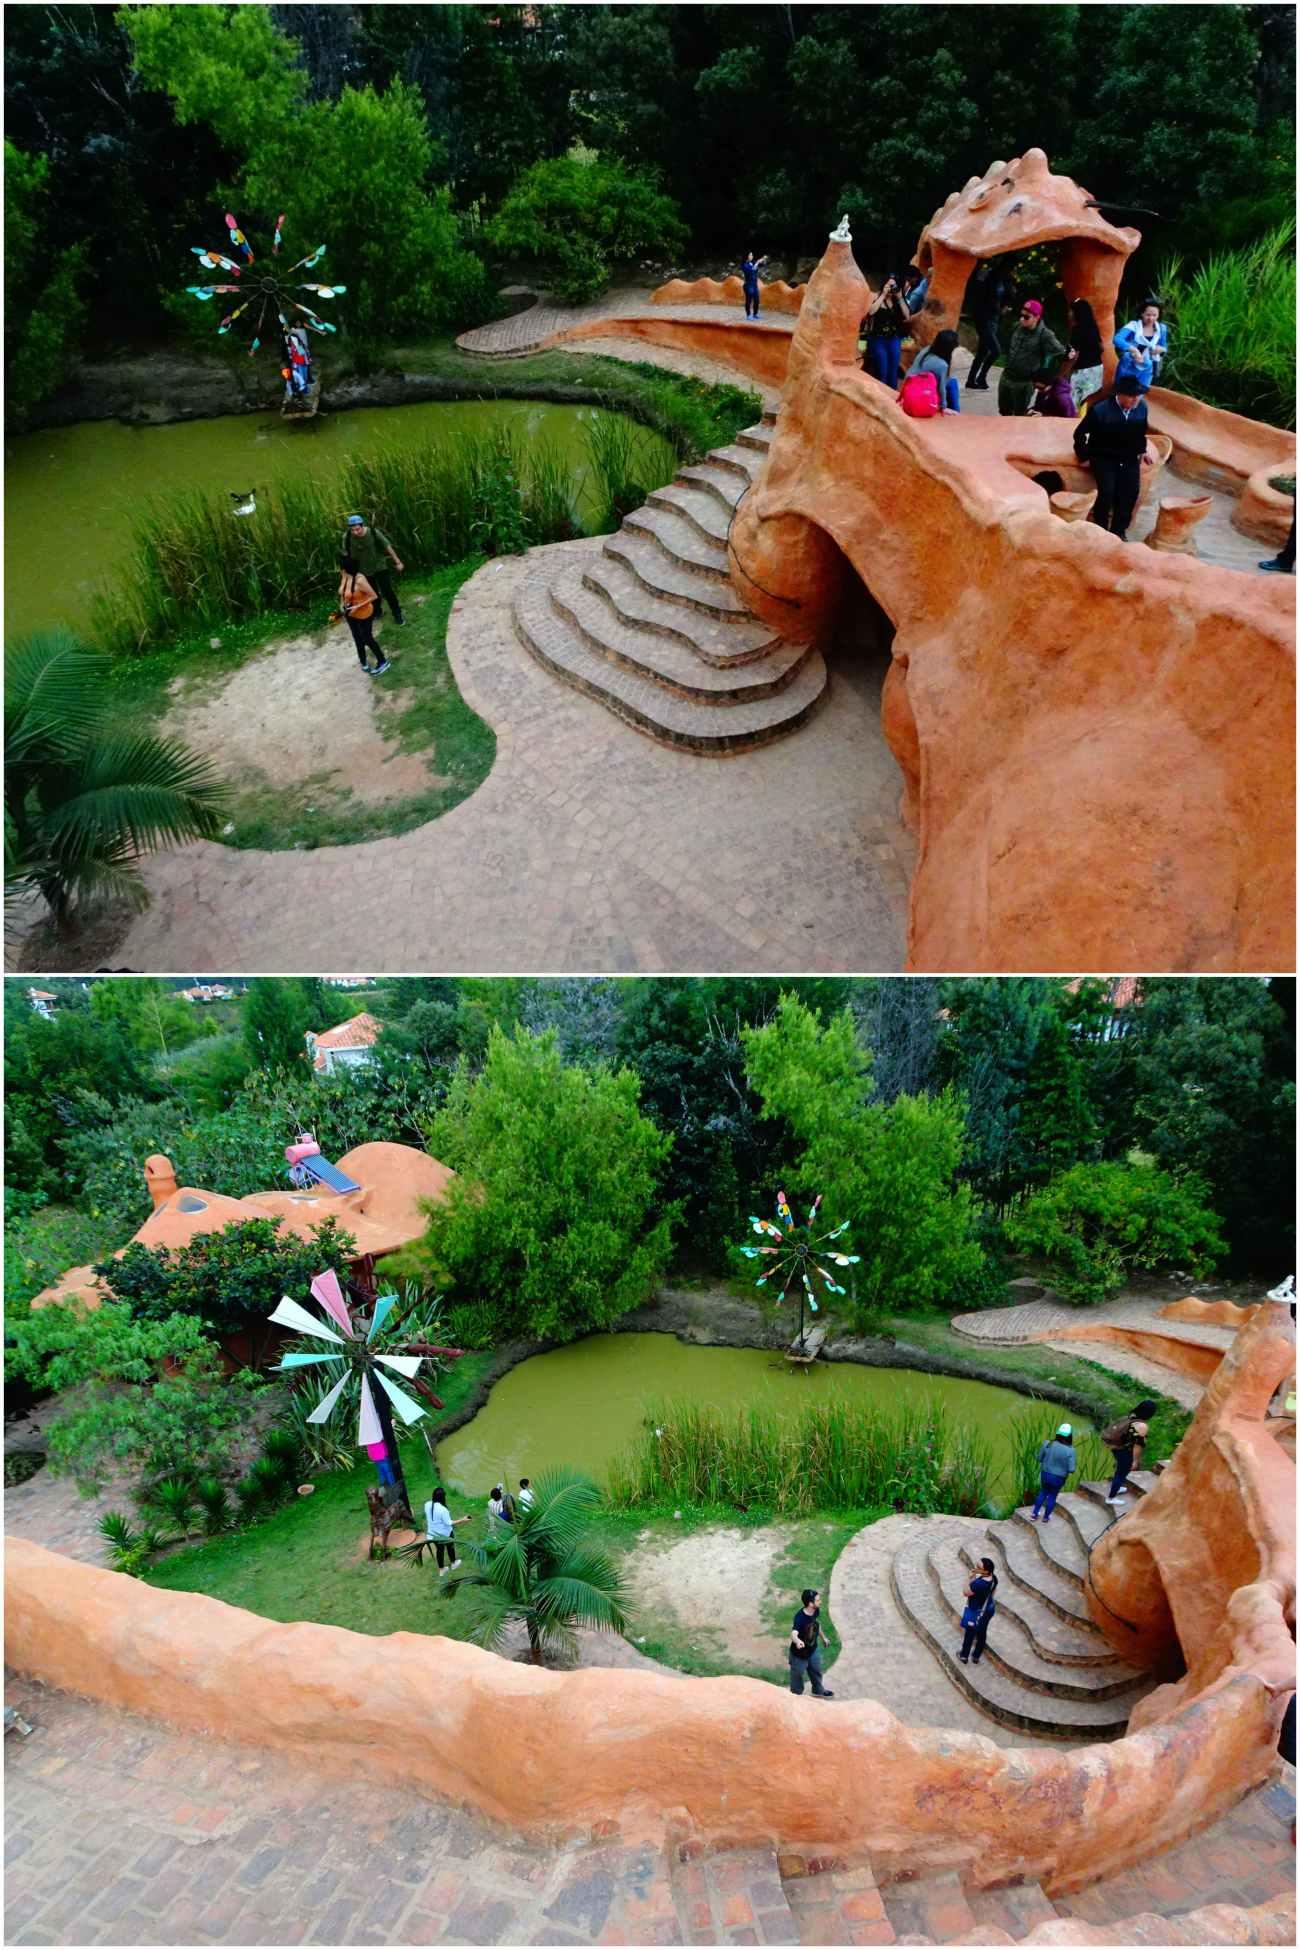 Casa terracotta jardin1